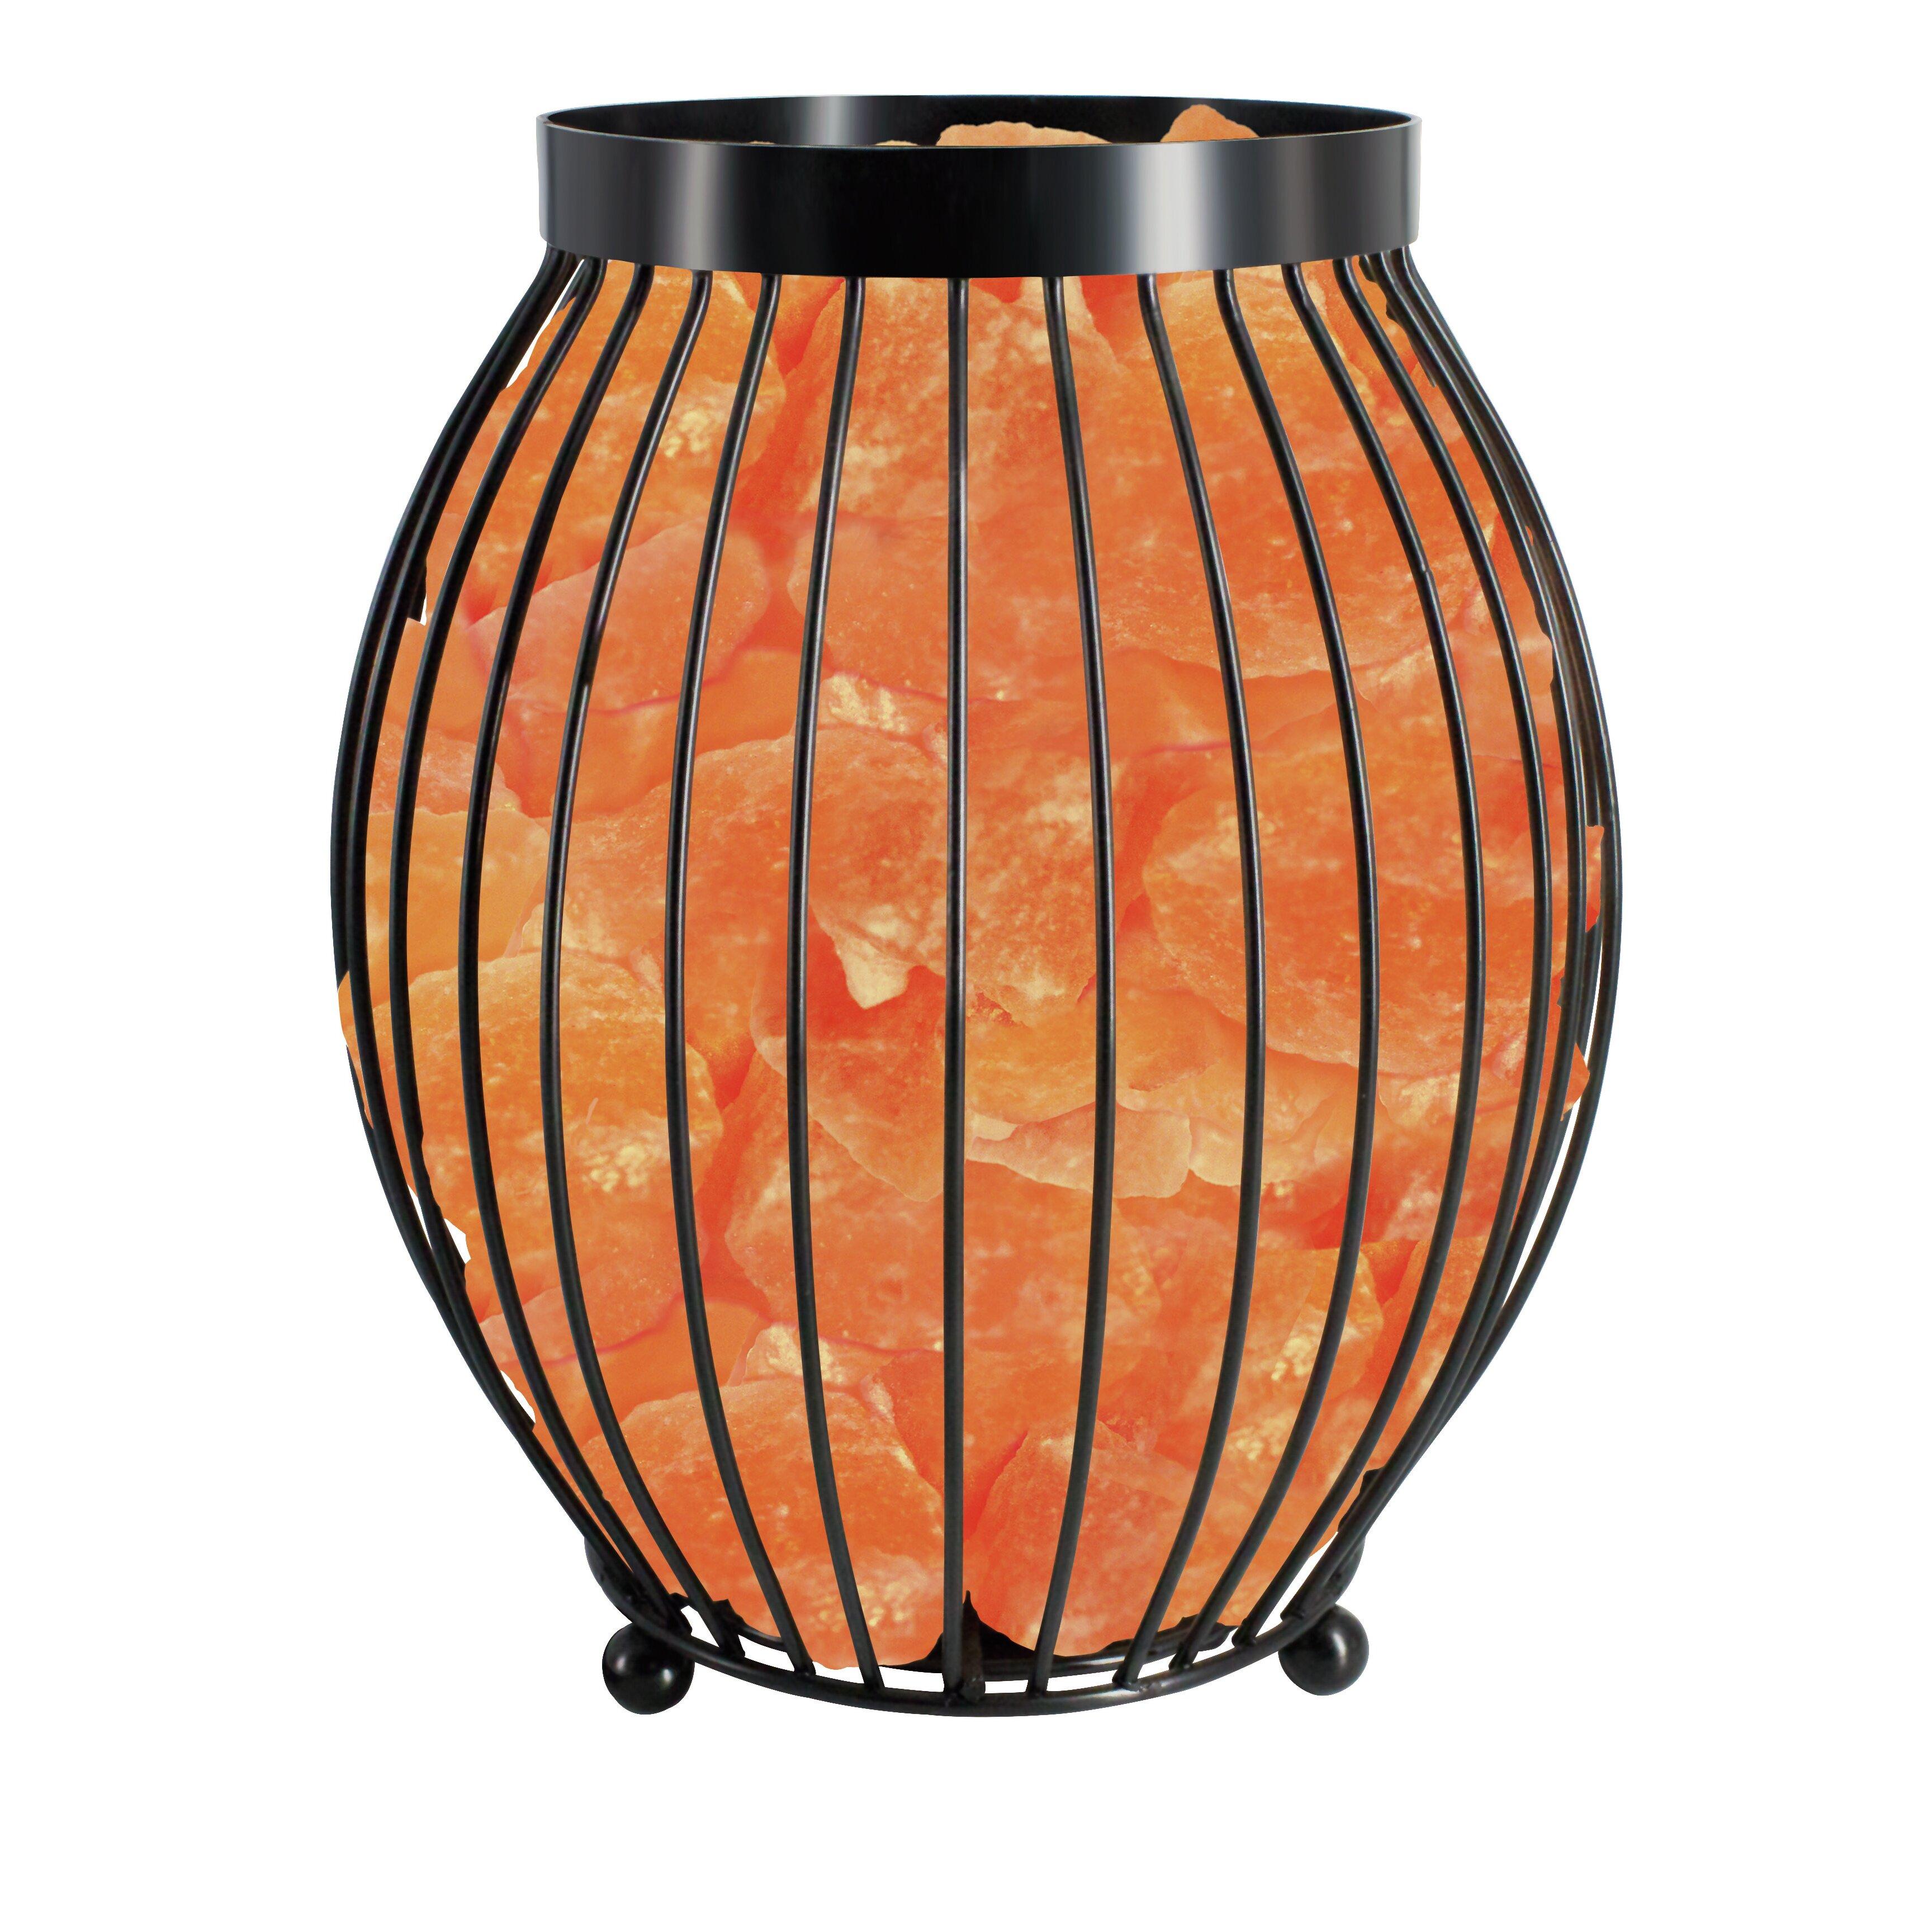 Wbm llc himalayan glow 8 3 table lamp reviews wayfair for Himalayan glow salt crystal lamp reviews